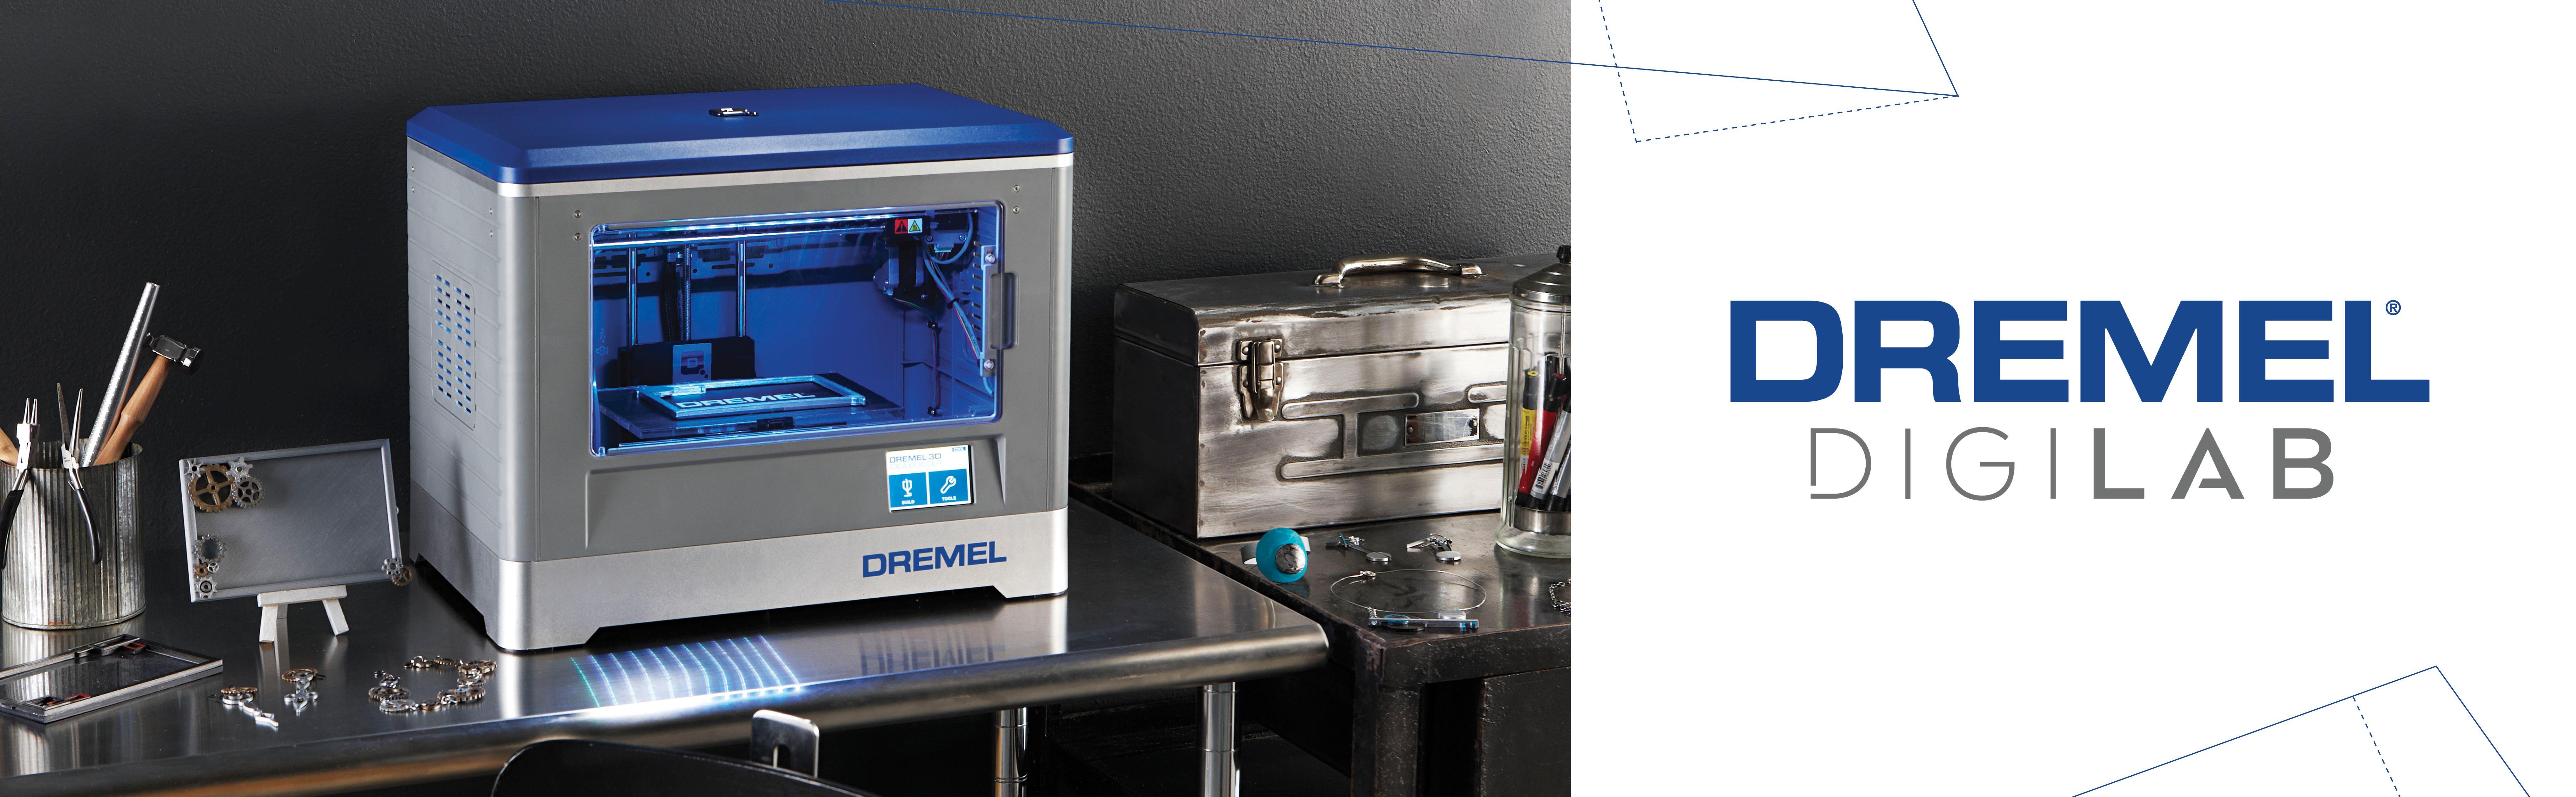 dremel digilab 3d20 3d printer idea builder for tinkerers